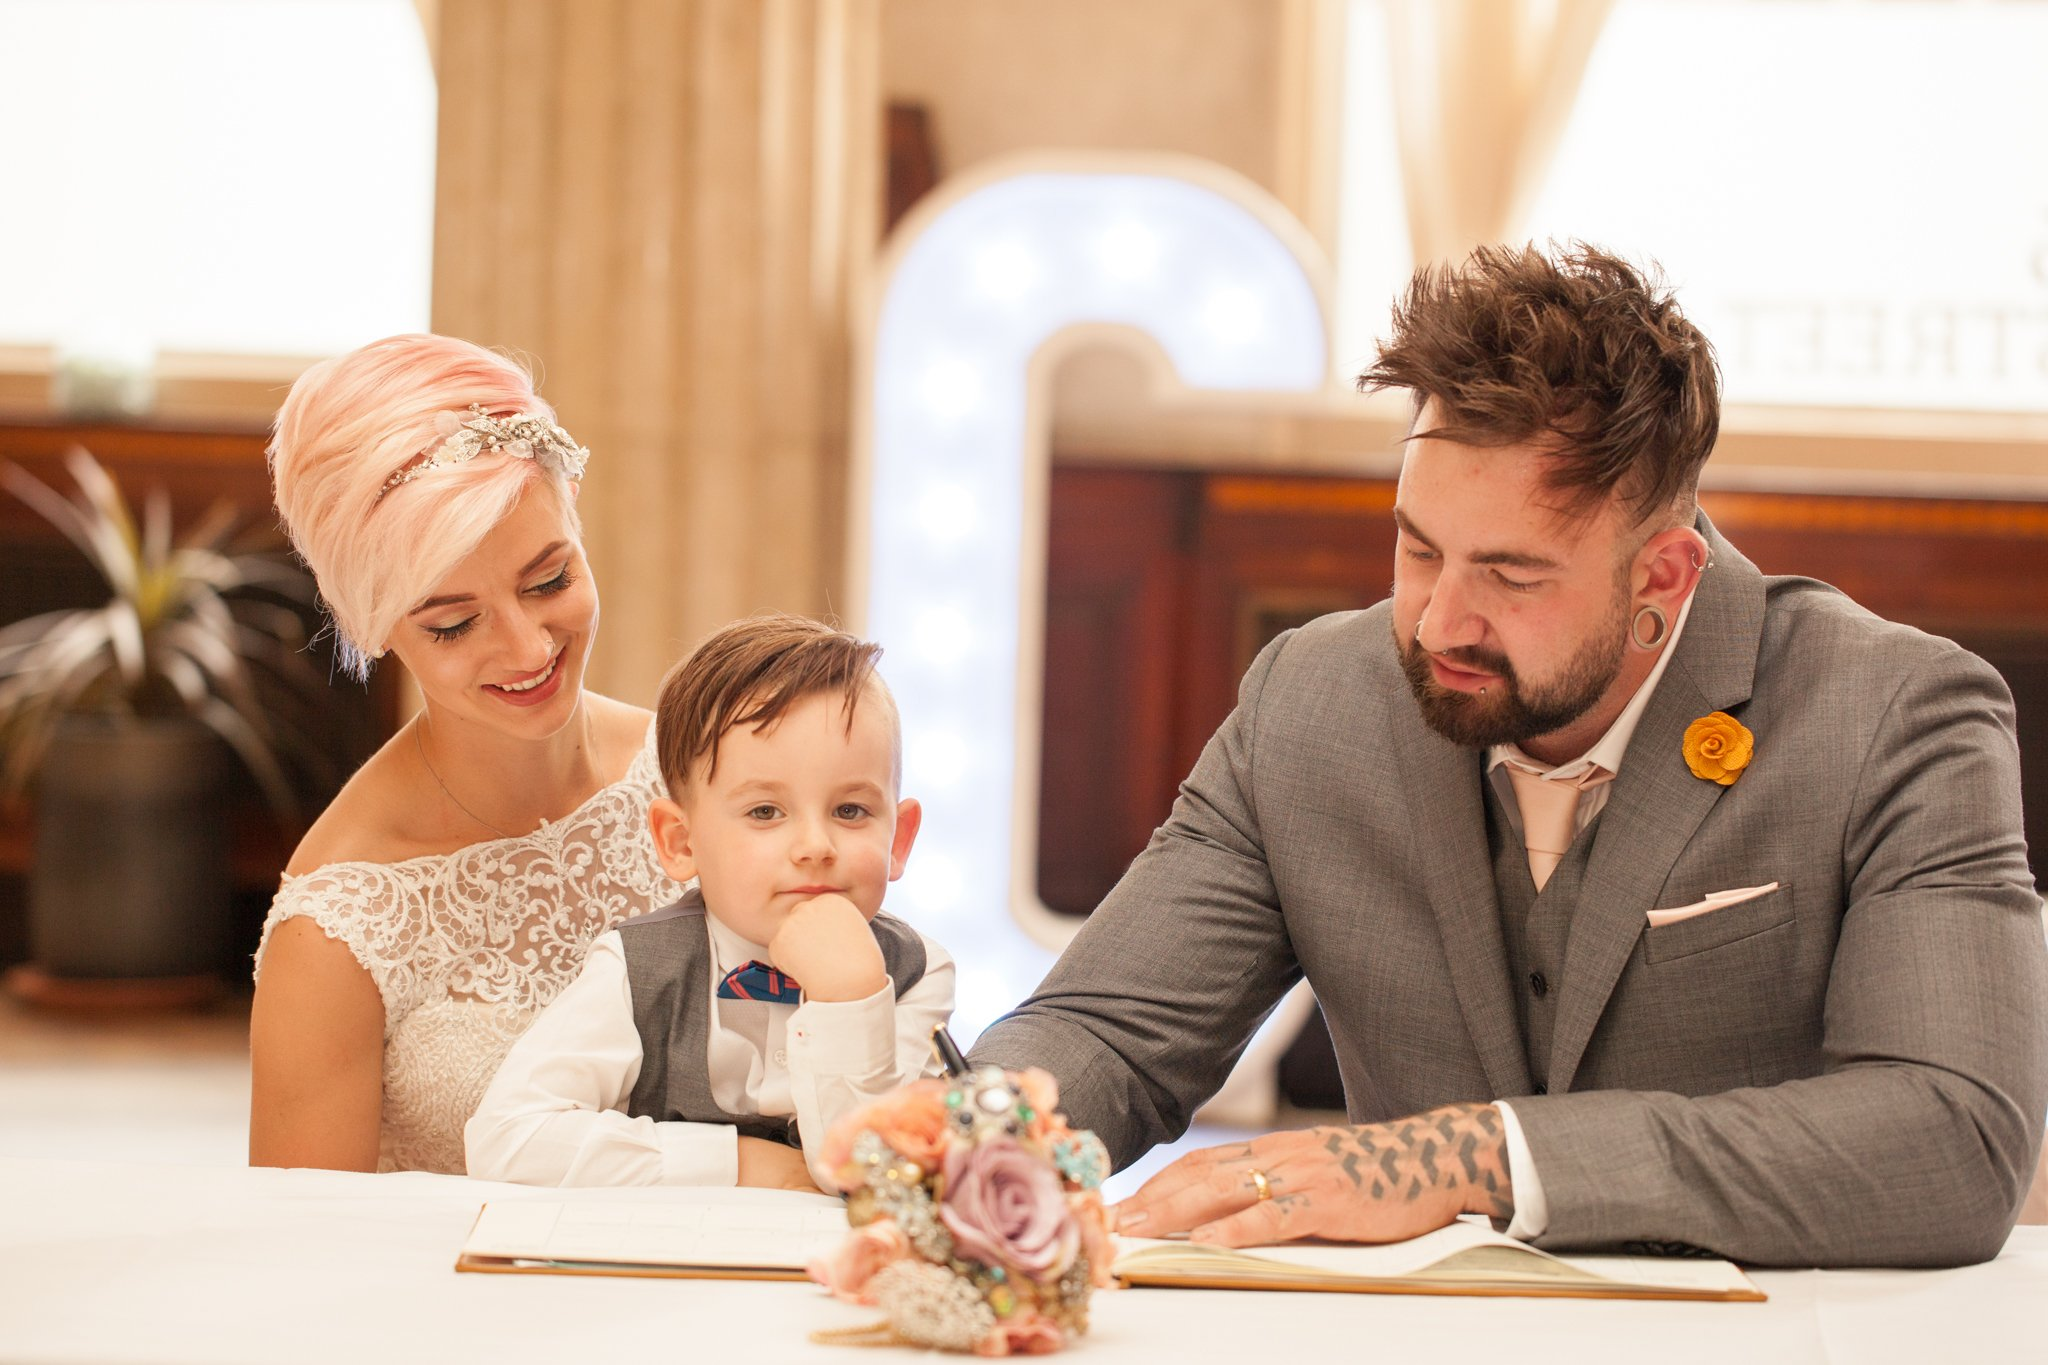 Portland House Cardiff Wedding, Tania Miller Photography, Cardiff wedding photographer